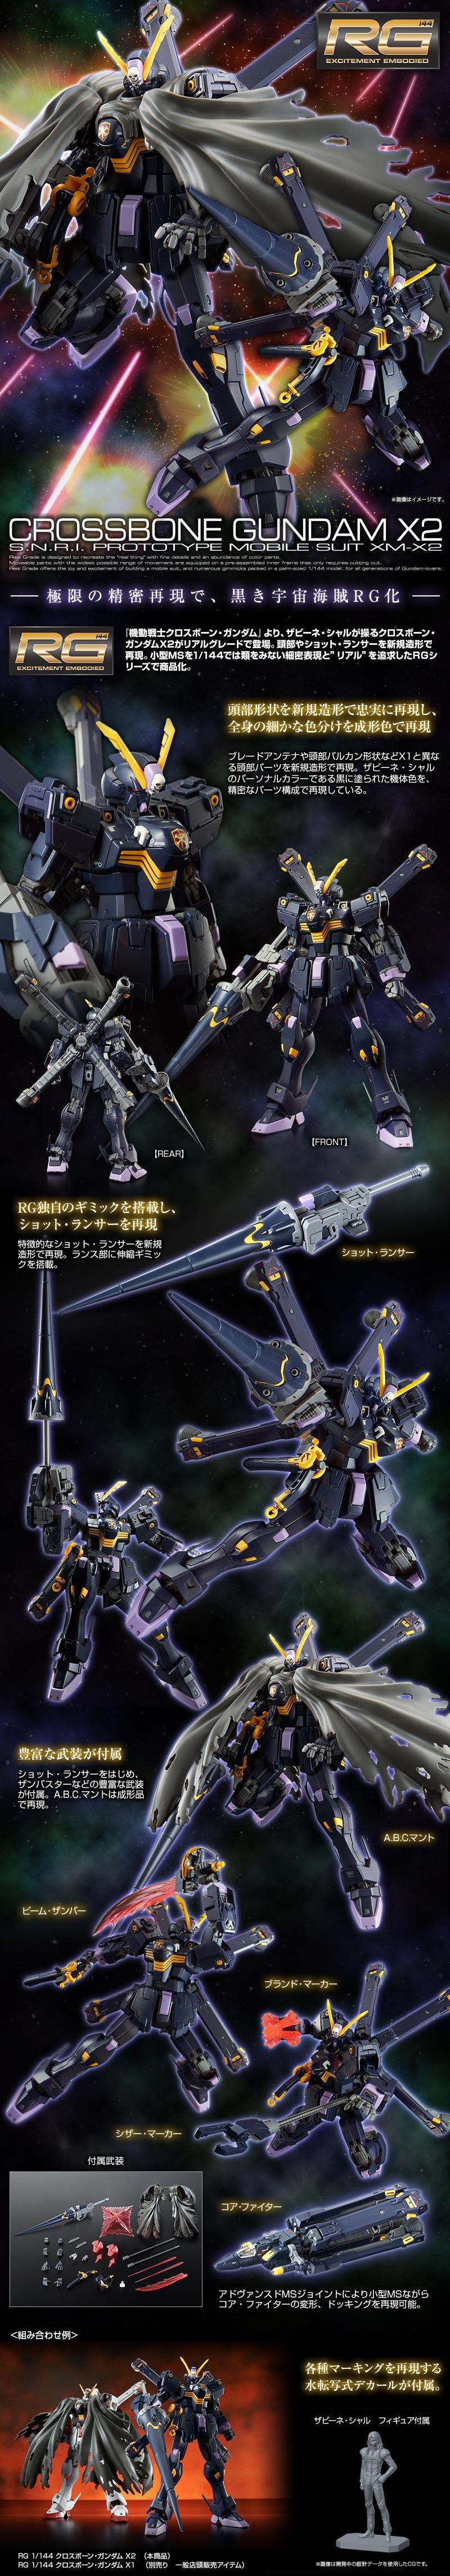 RG Crossbone X2 Details